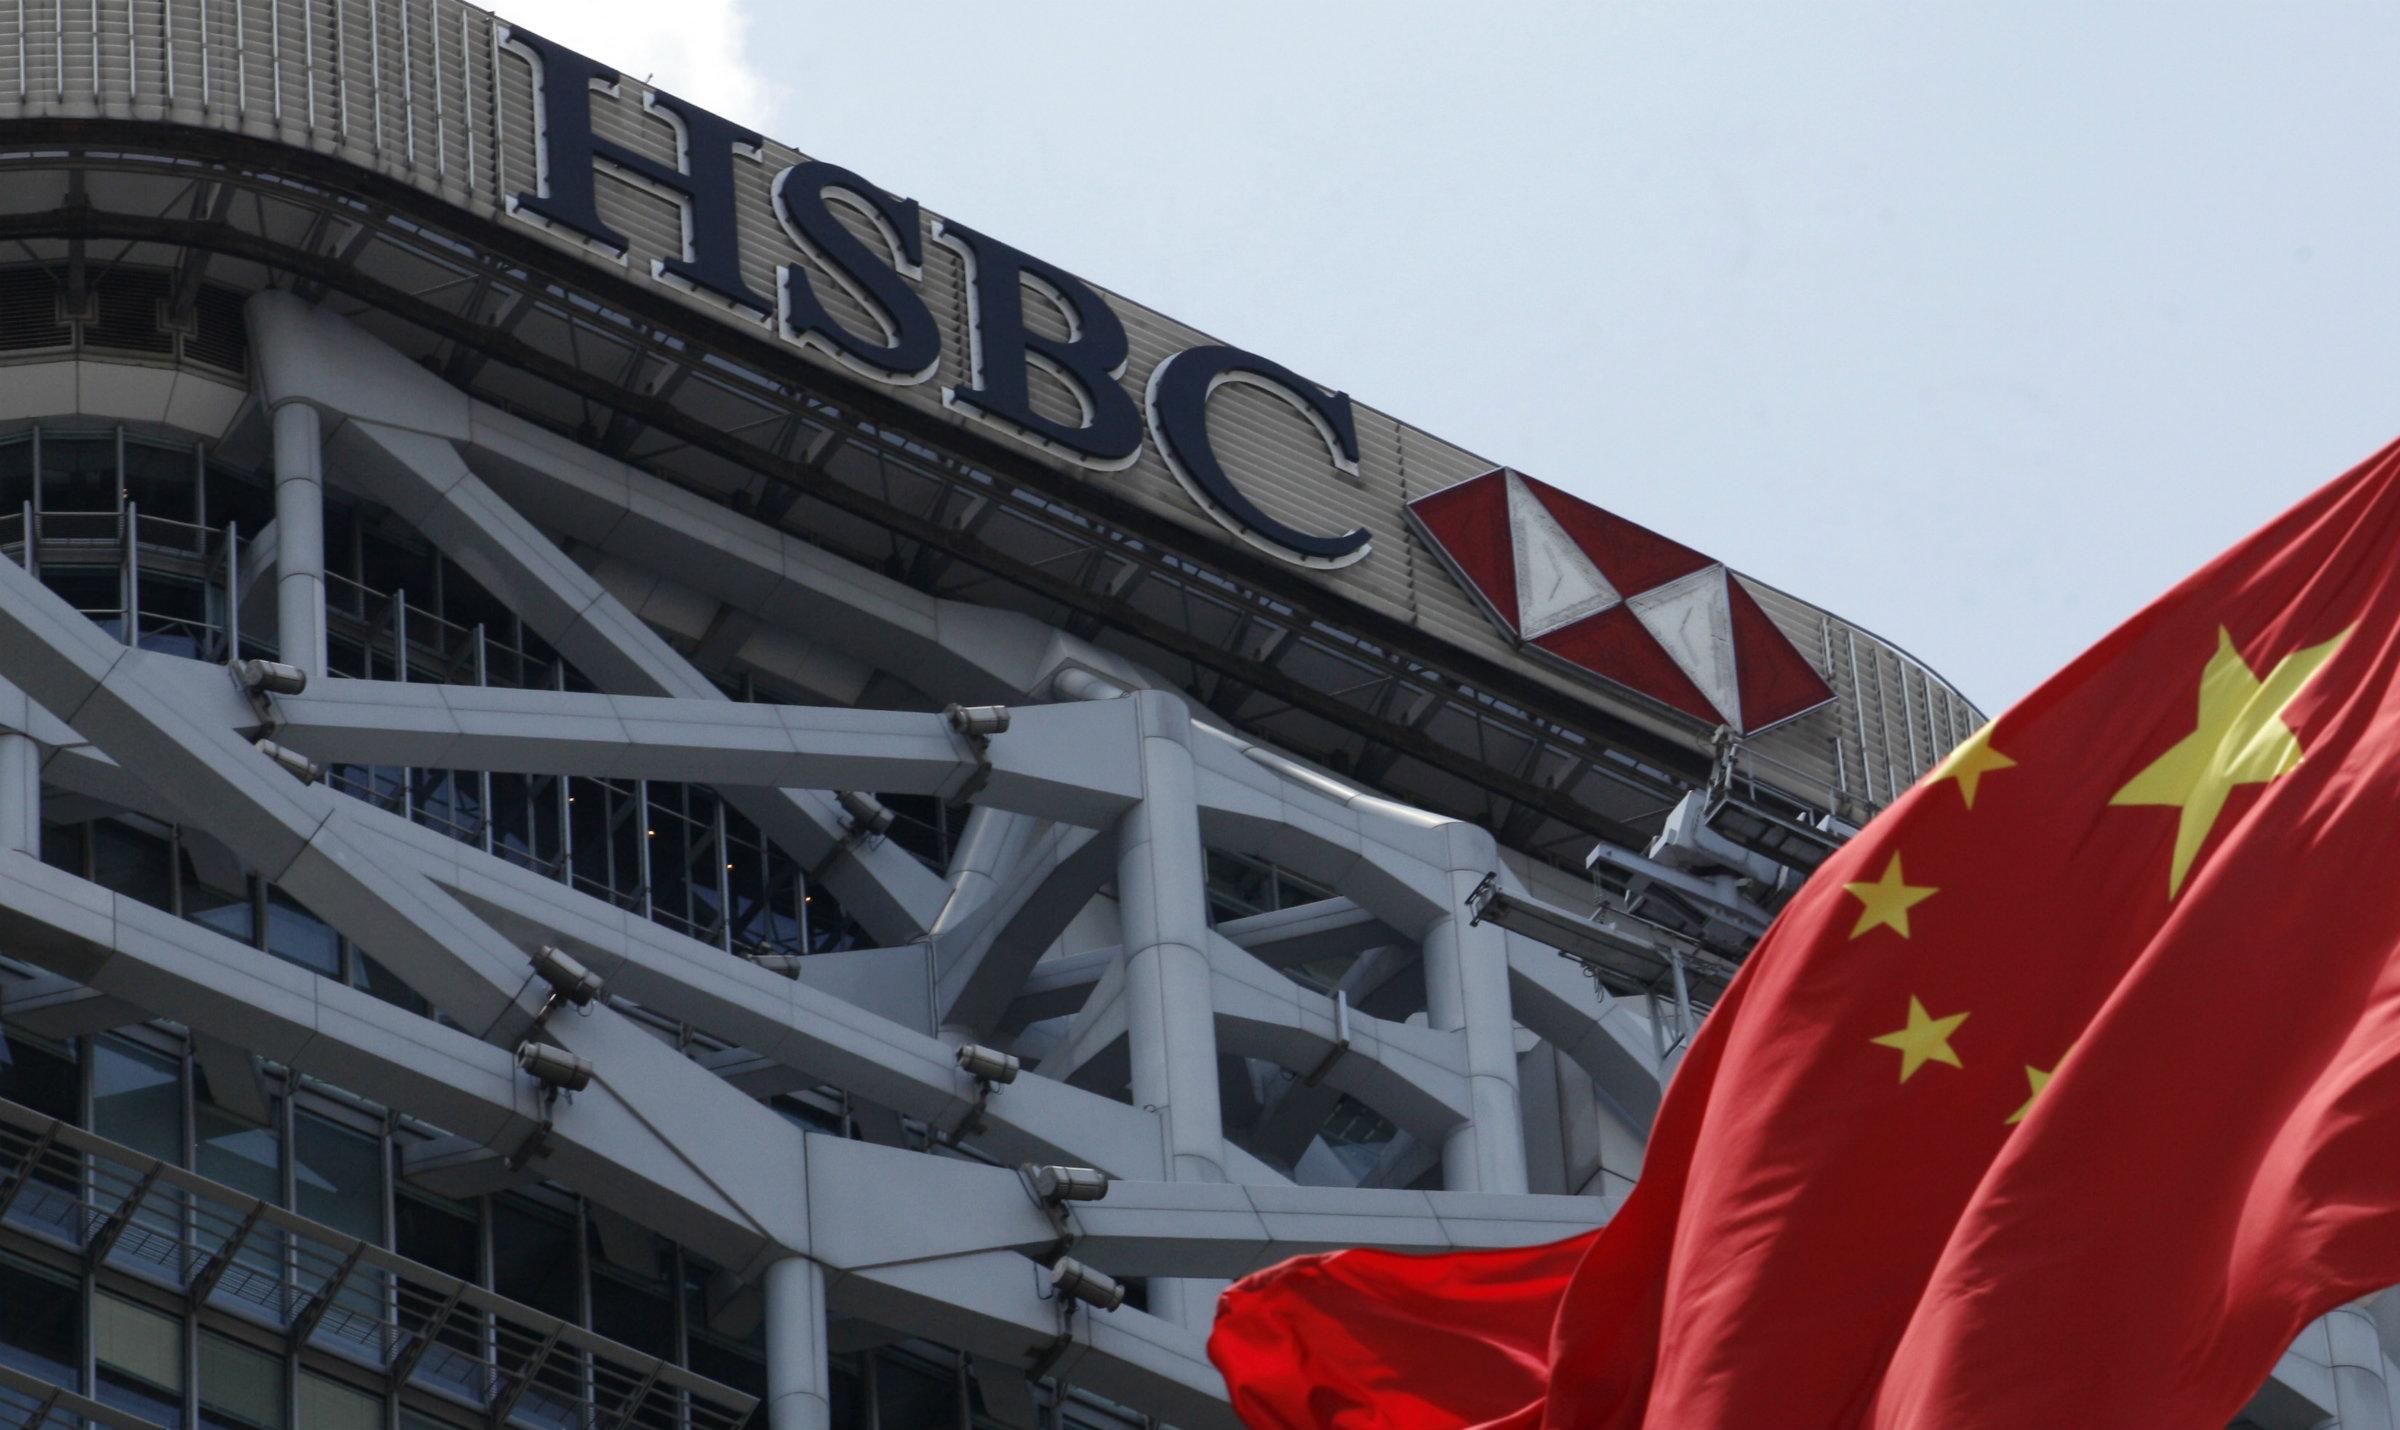 HSBC's headquarters in Hong Kong.